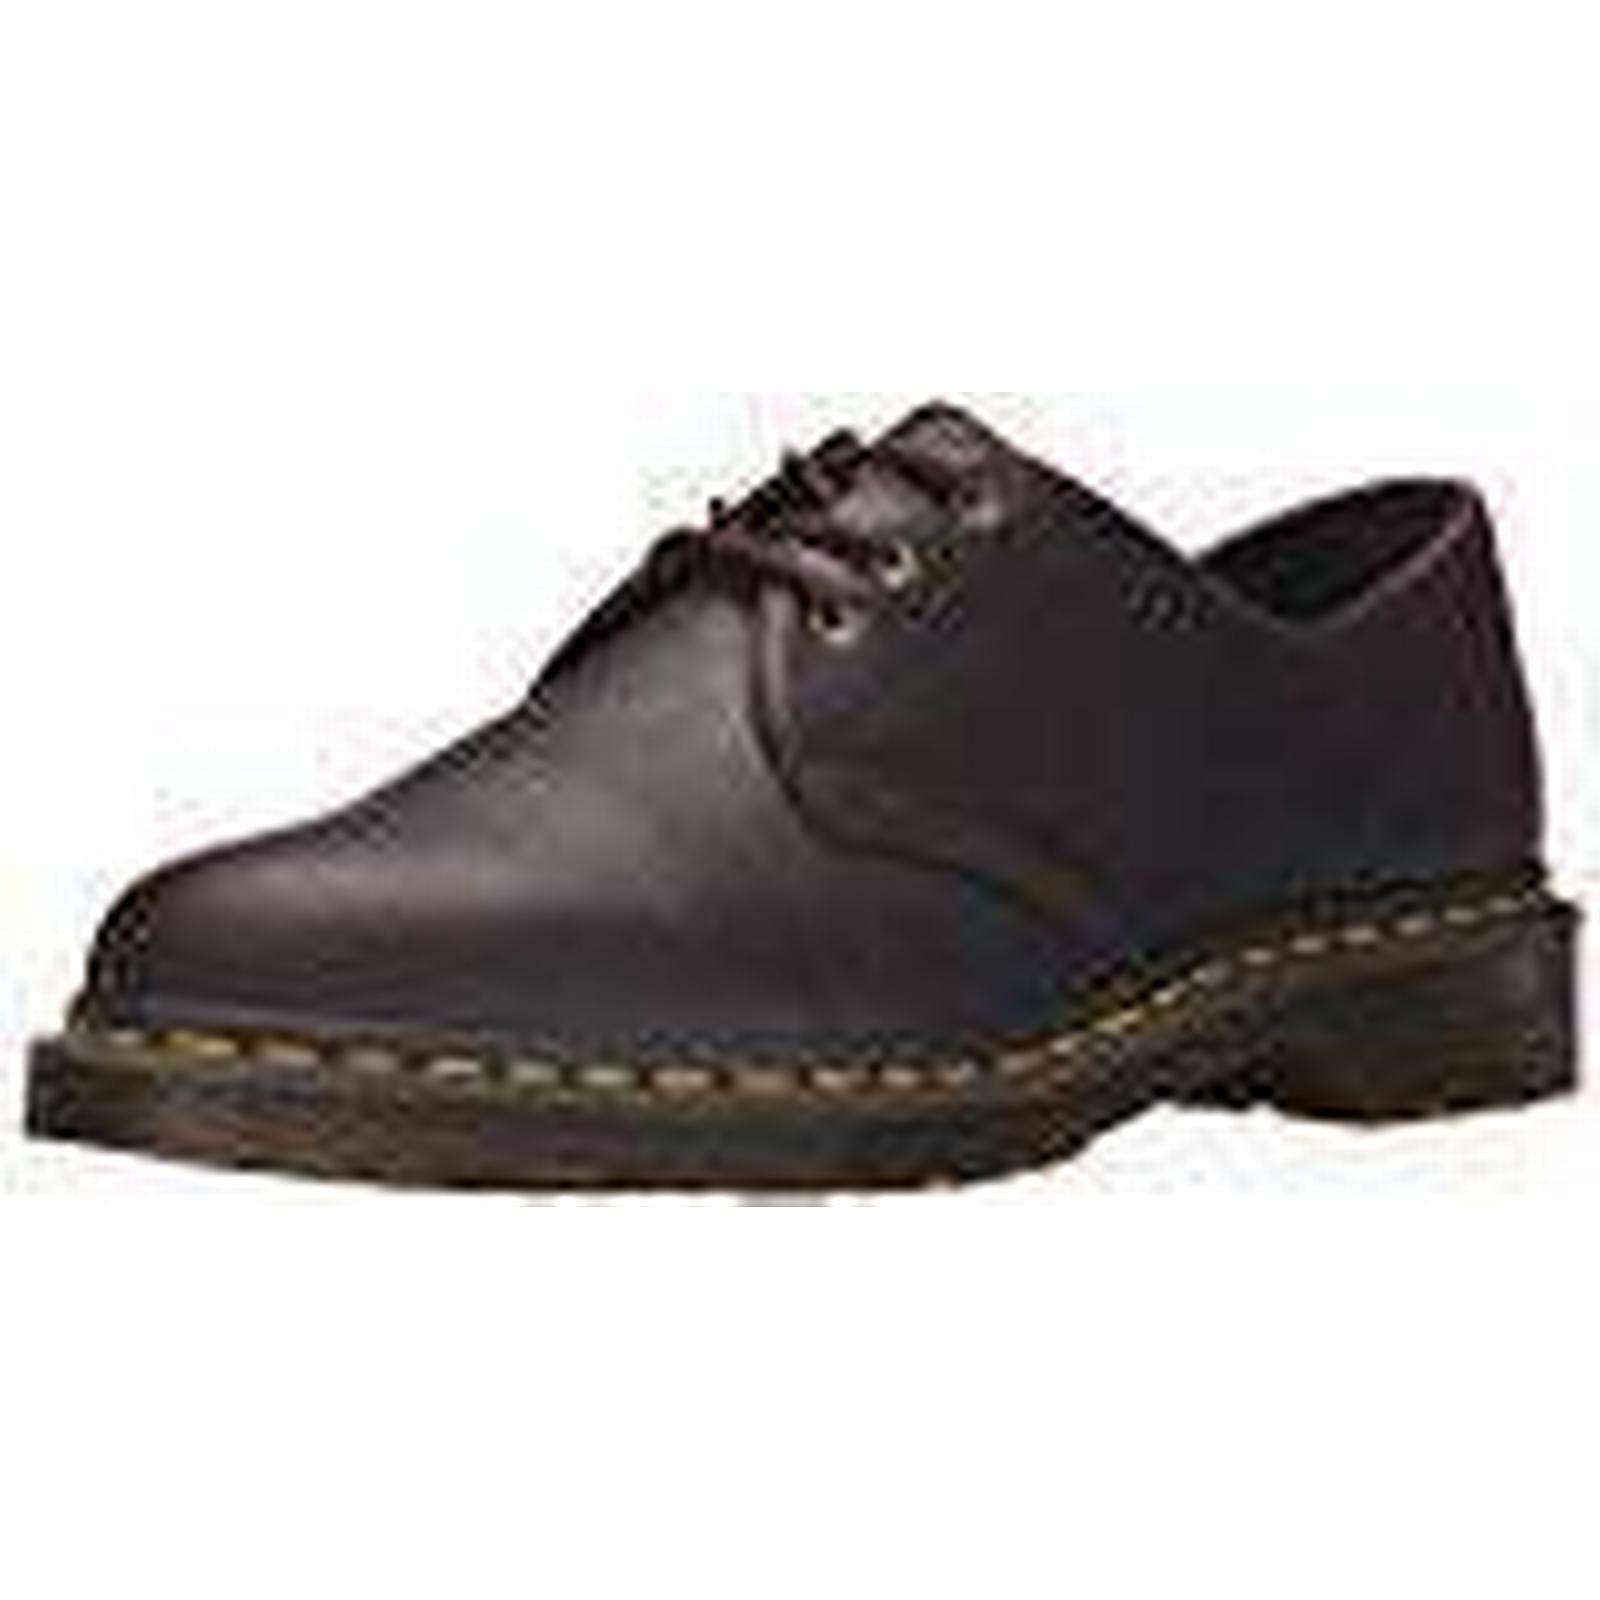 Dr. Martens Unisex UK Adults' 1461 Derbys, Brown (Black), 6 UK Unisex 39 EU 7ca010